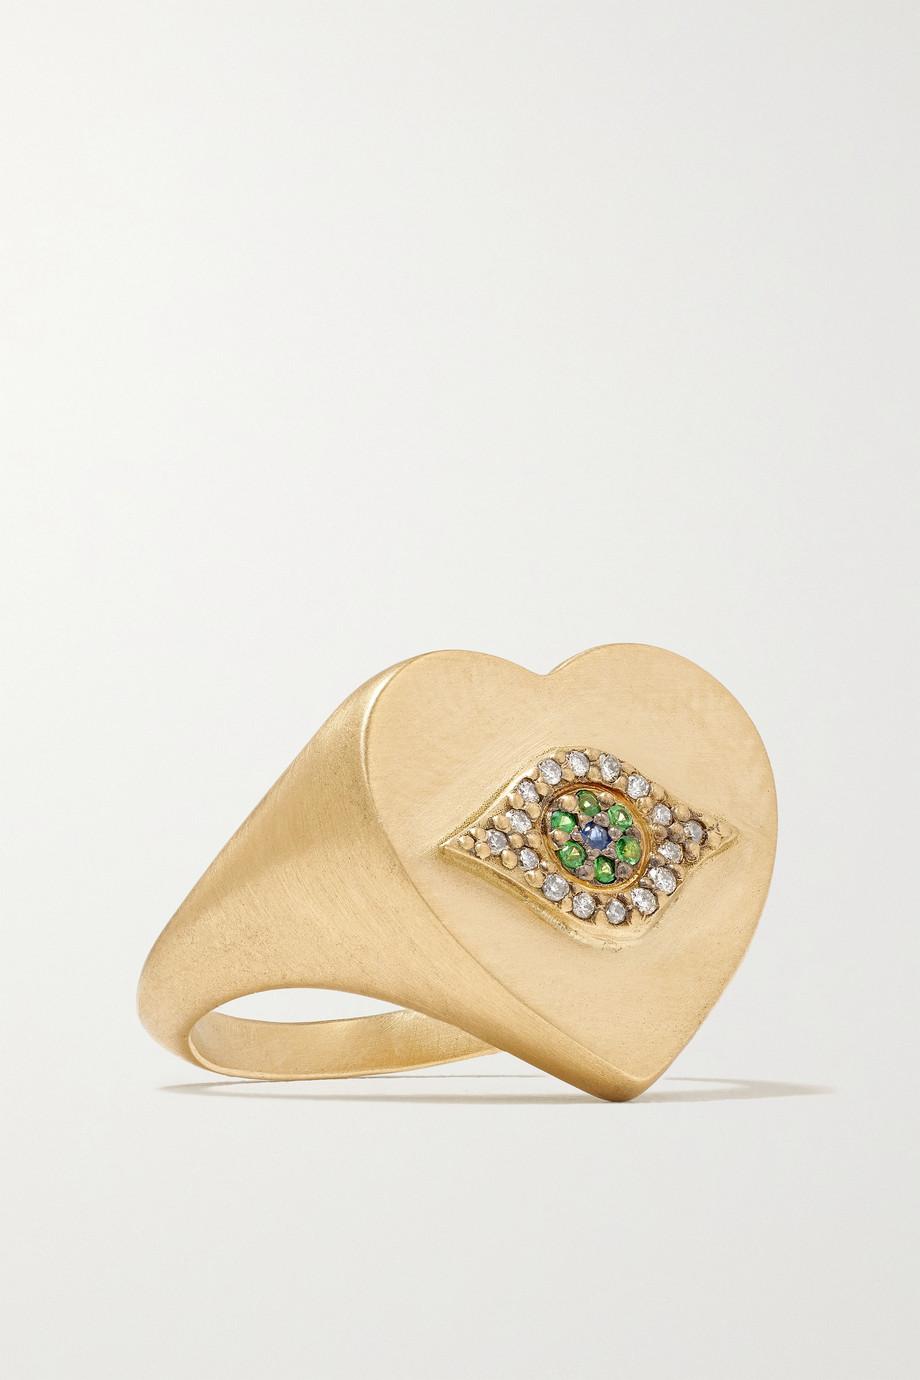 Ileana Makri Golden Dawn 18-karat gold multi-stone ring